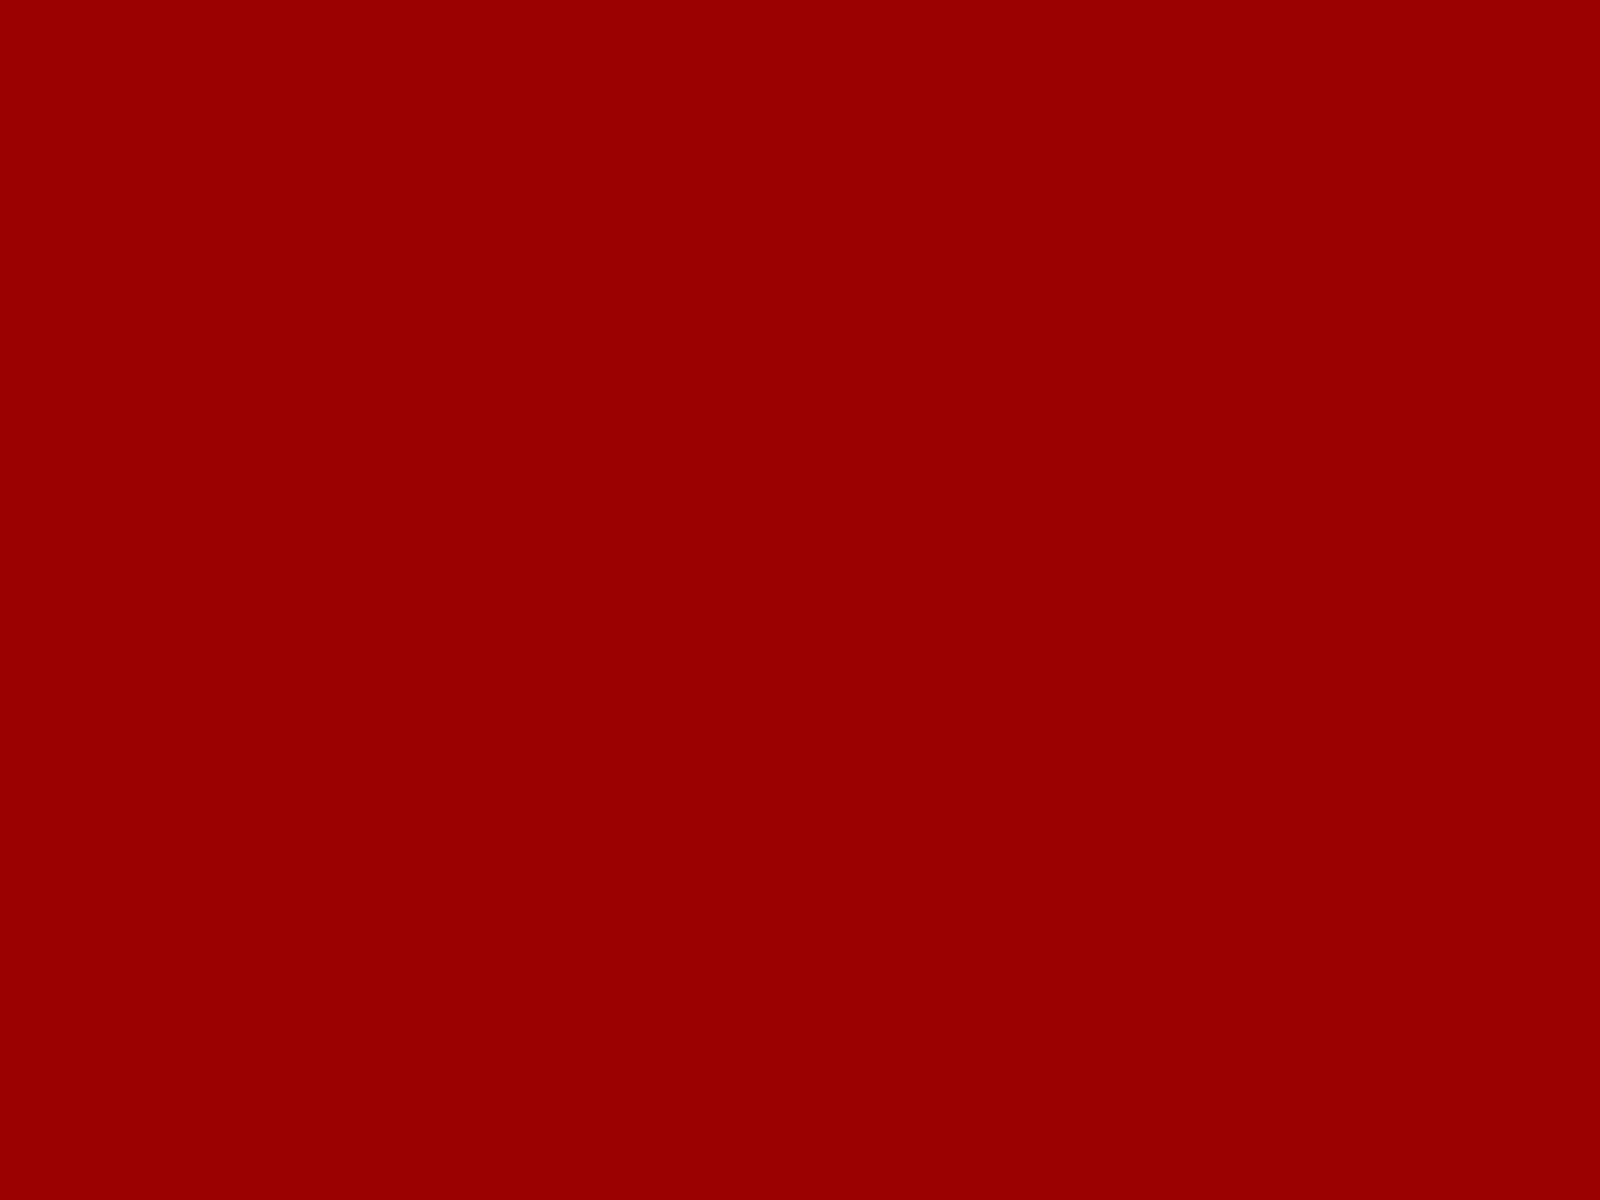 liturgical calendar  about those colors  u2026